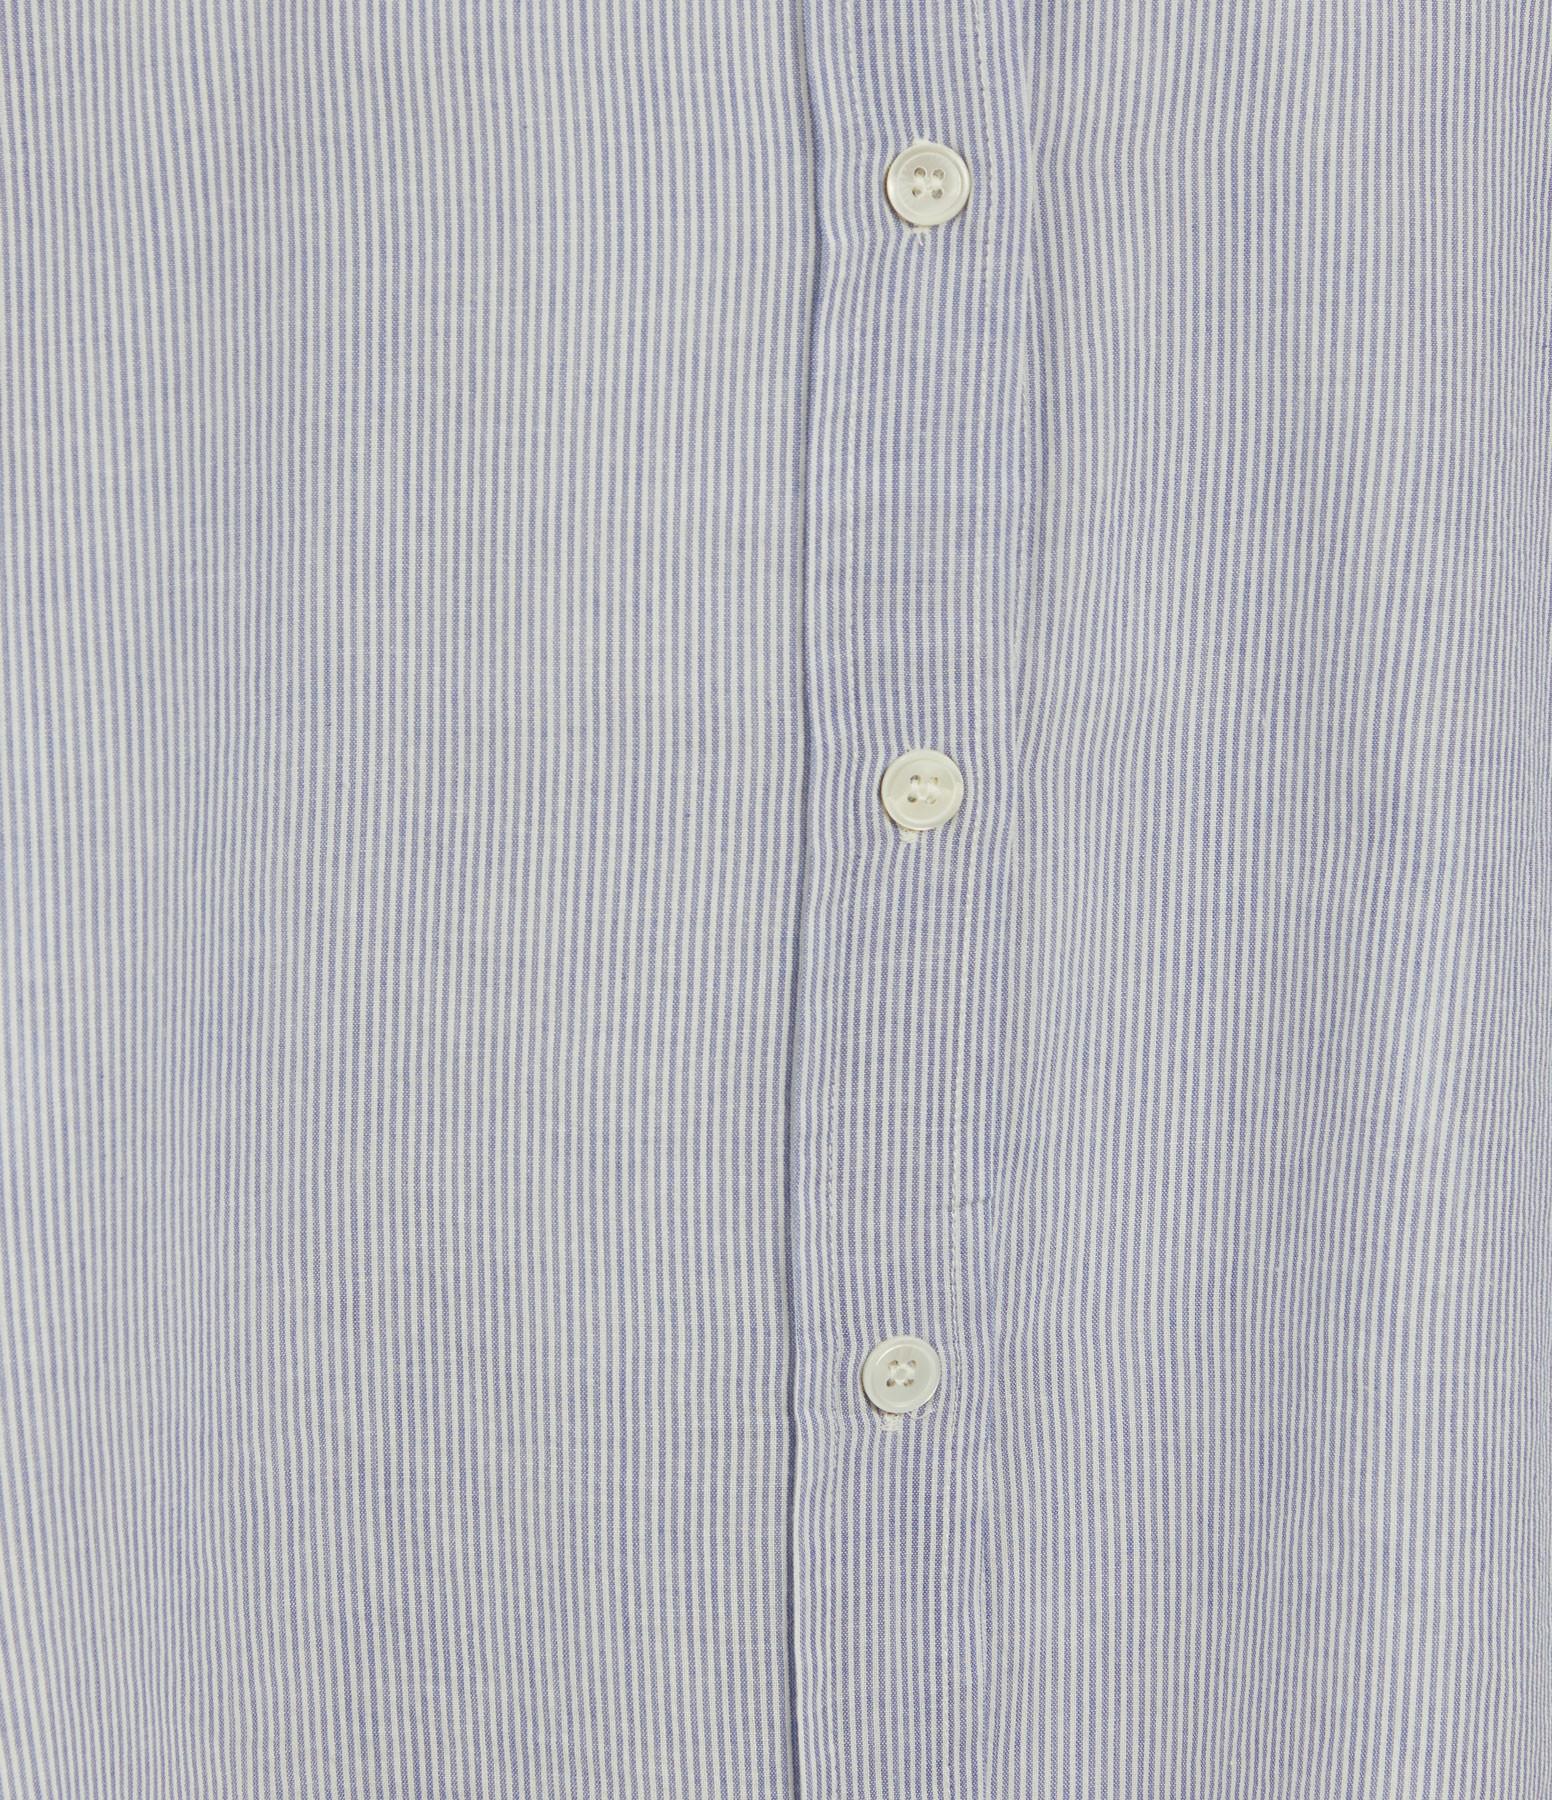 VANESSA BRUNO - Blouse Lidiane Rayures Blanc Bleu